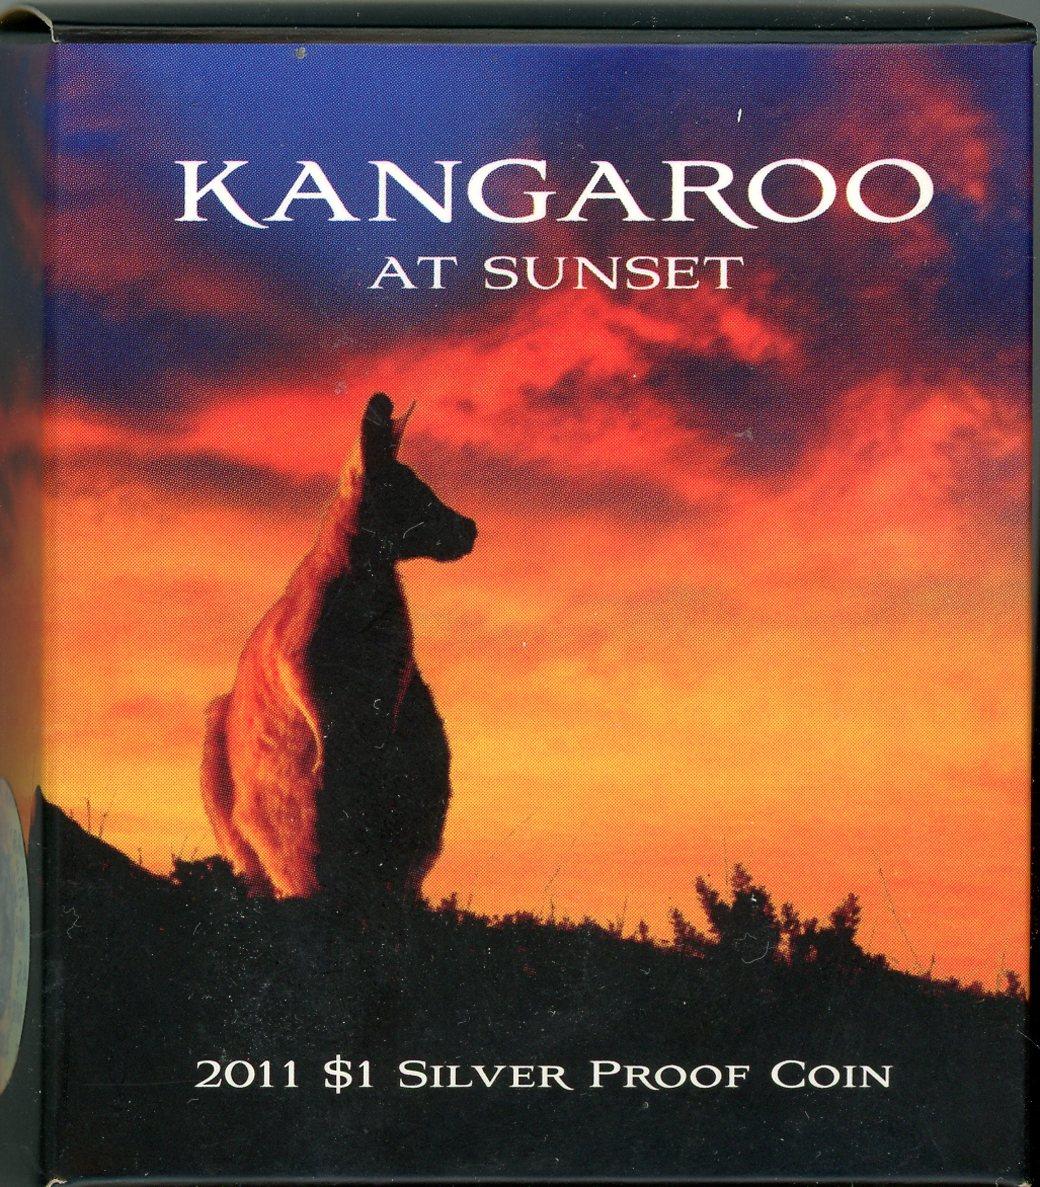 Thumbnail for 2011 $1 Silver Proof Coin - Kangaroo At Sunset